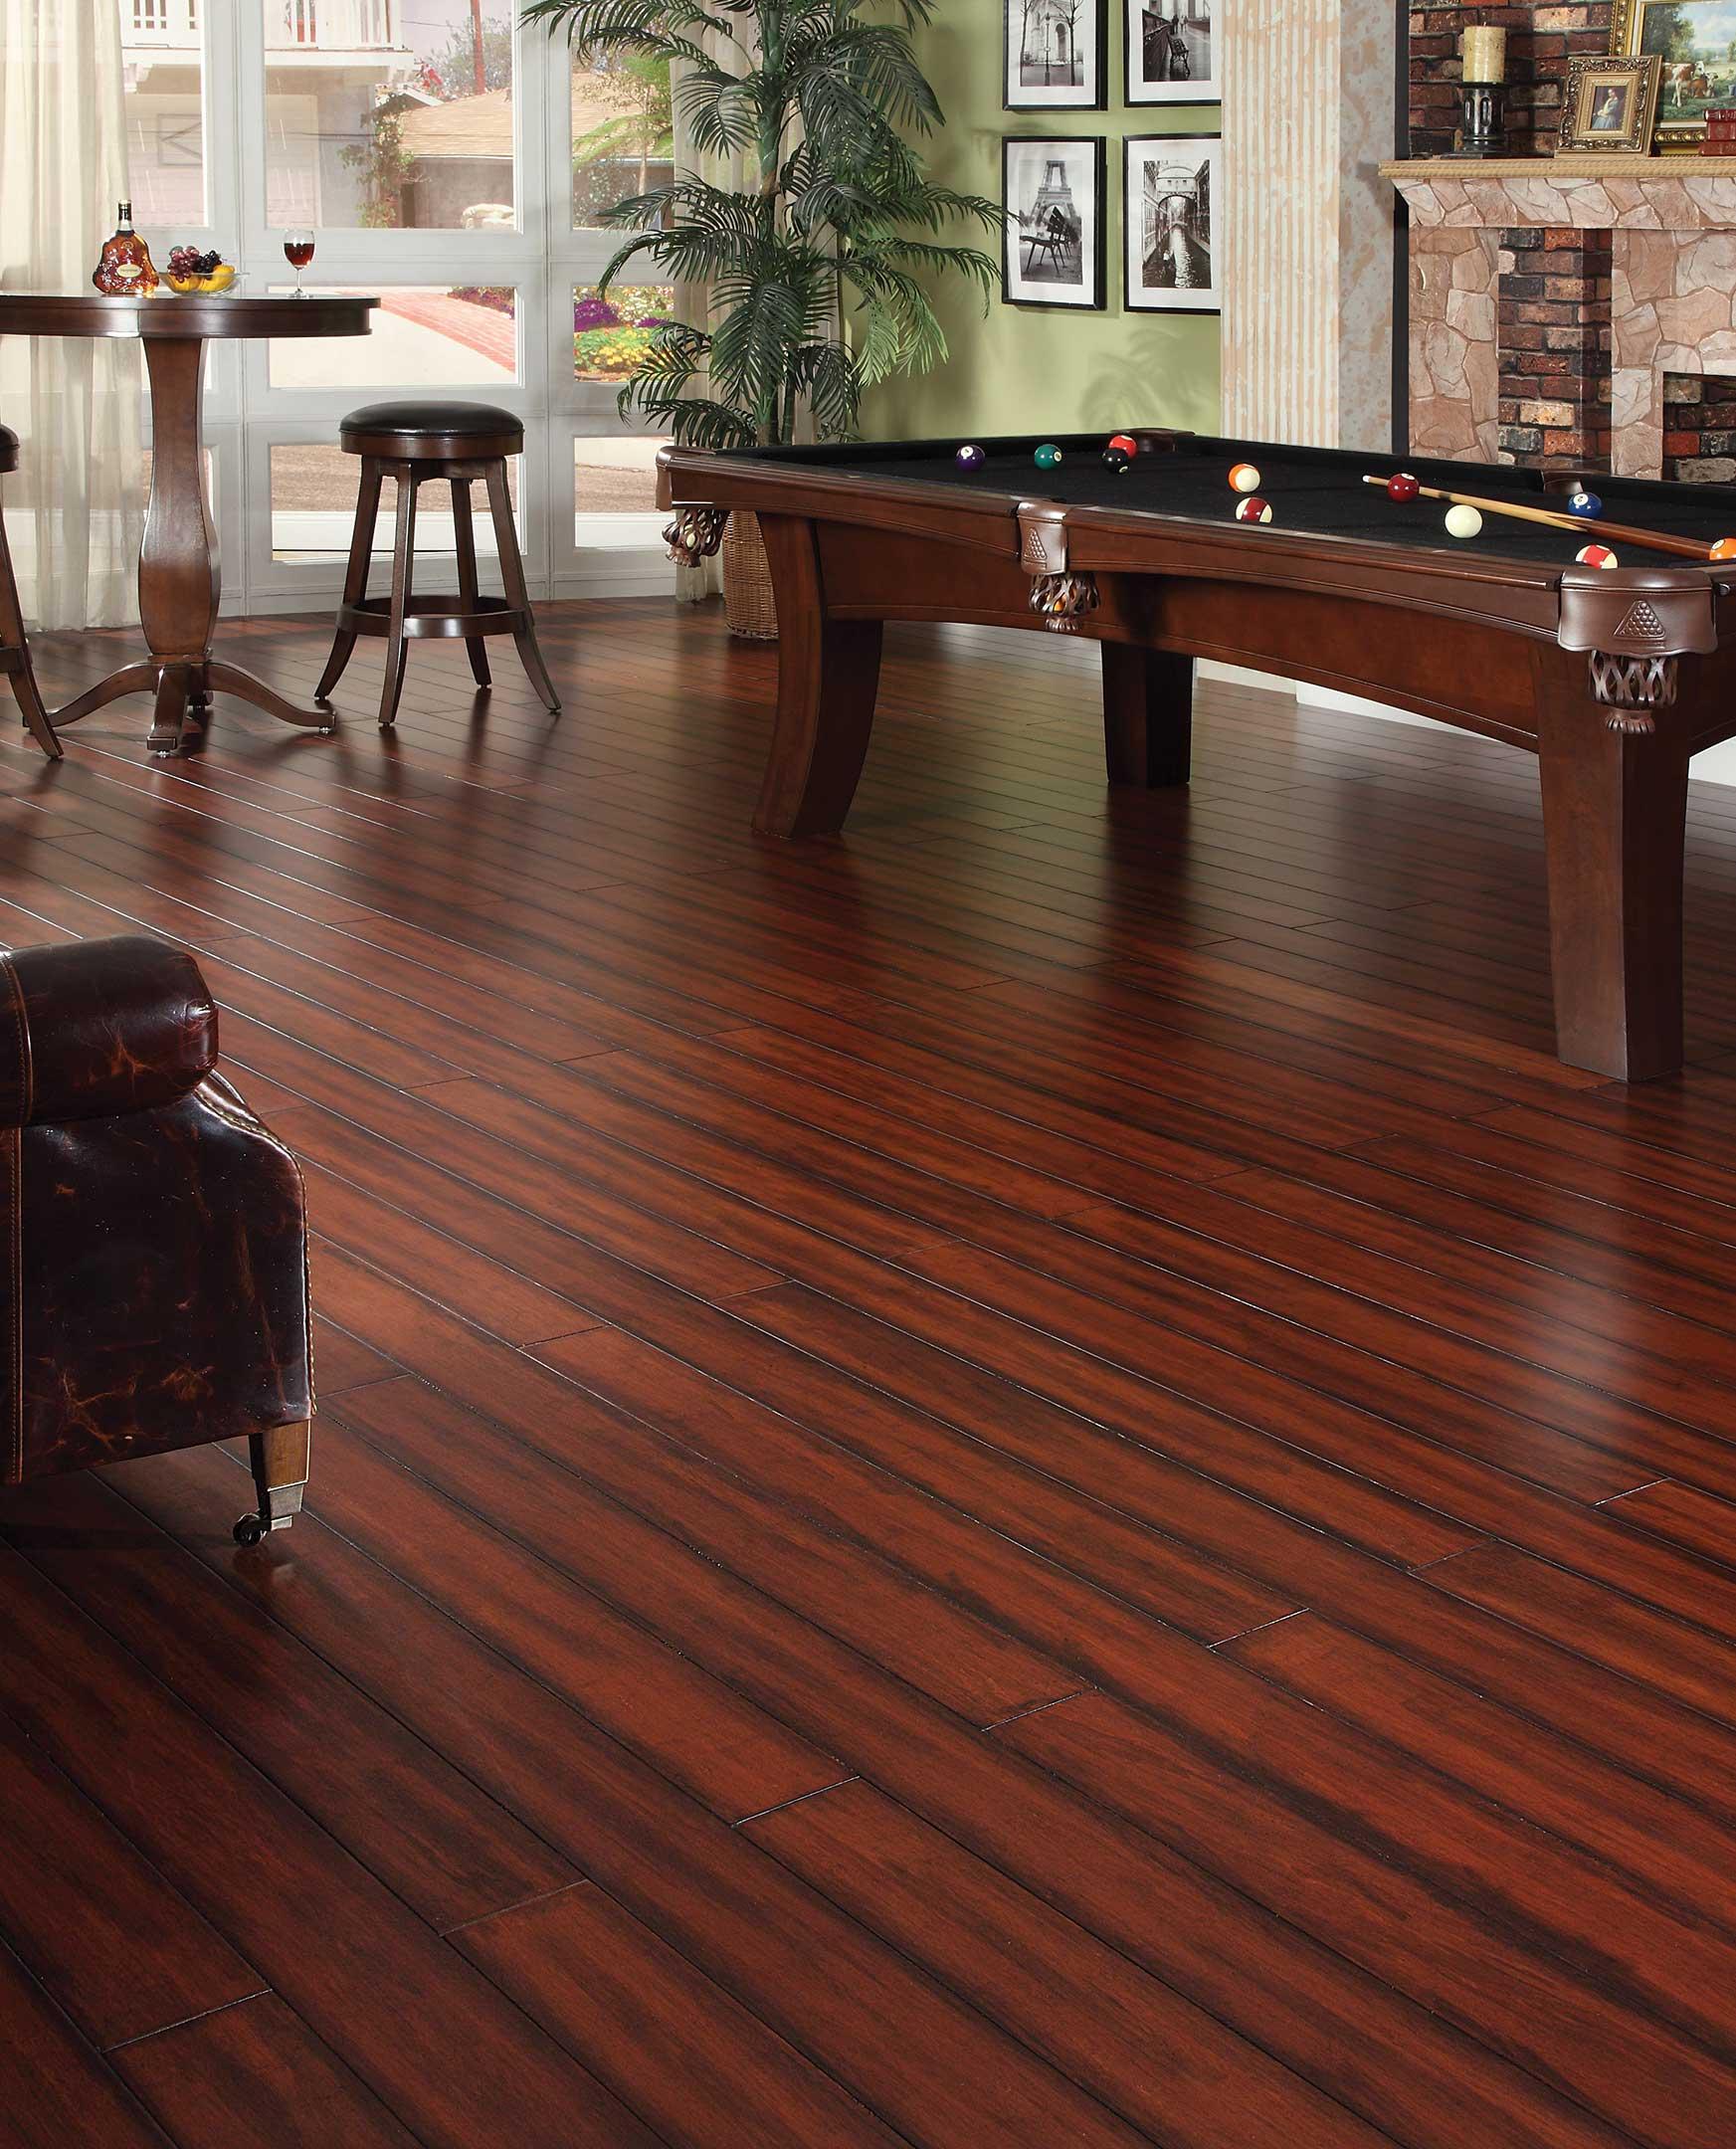 Flooring Hardwood Bamboo Tile Linoleum | Atlanta Home Improvement